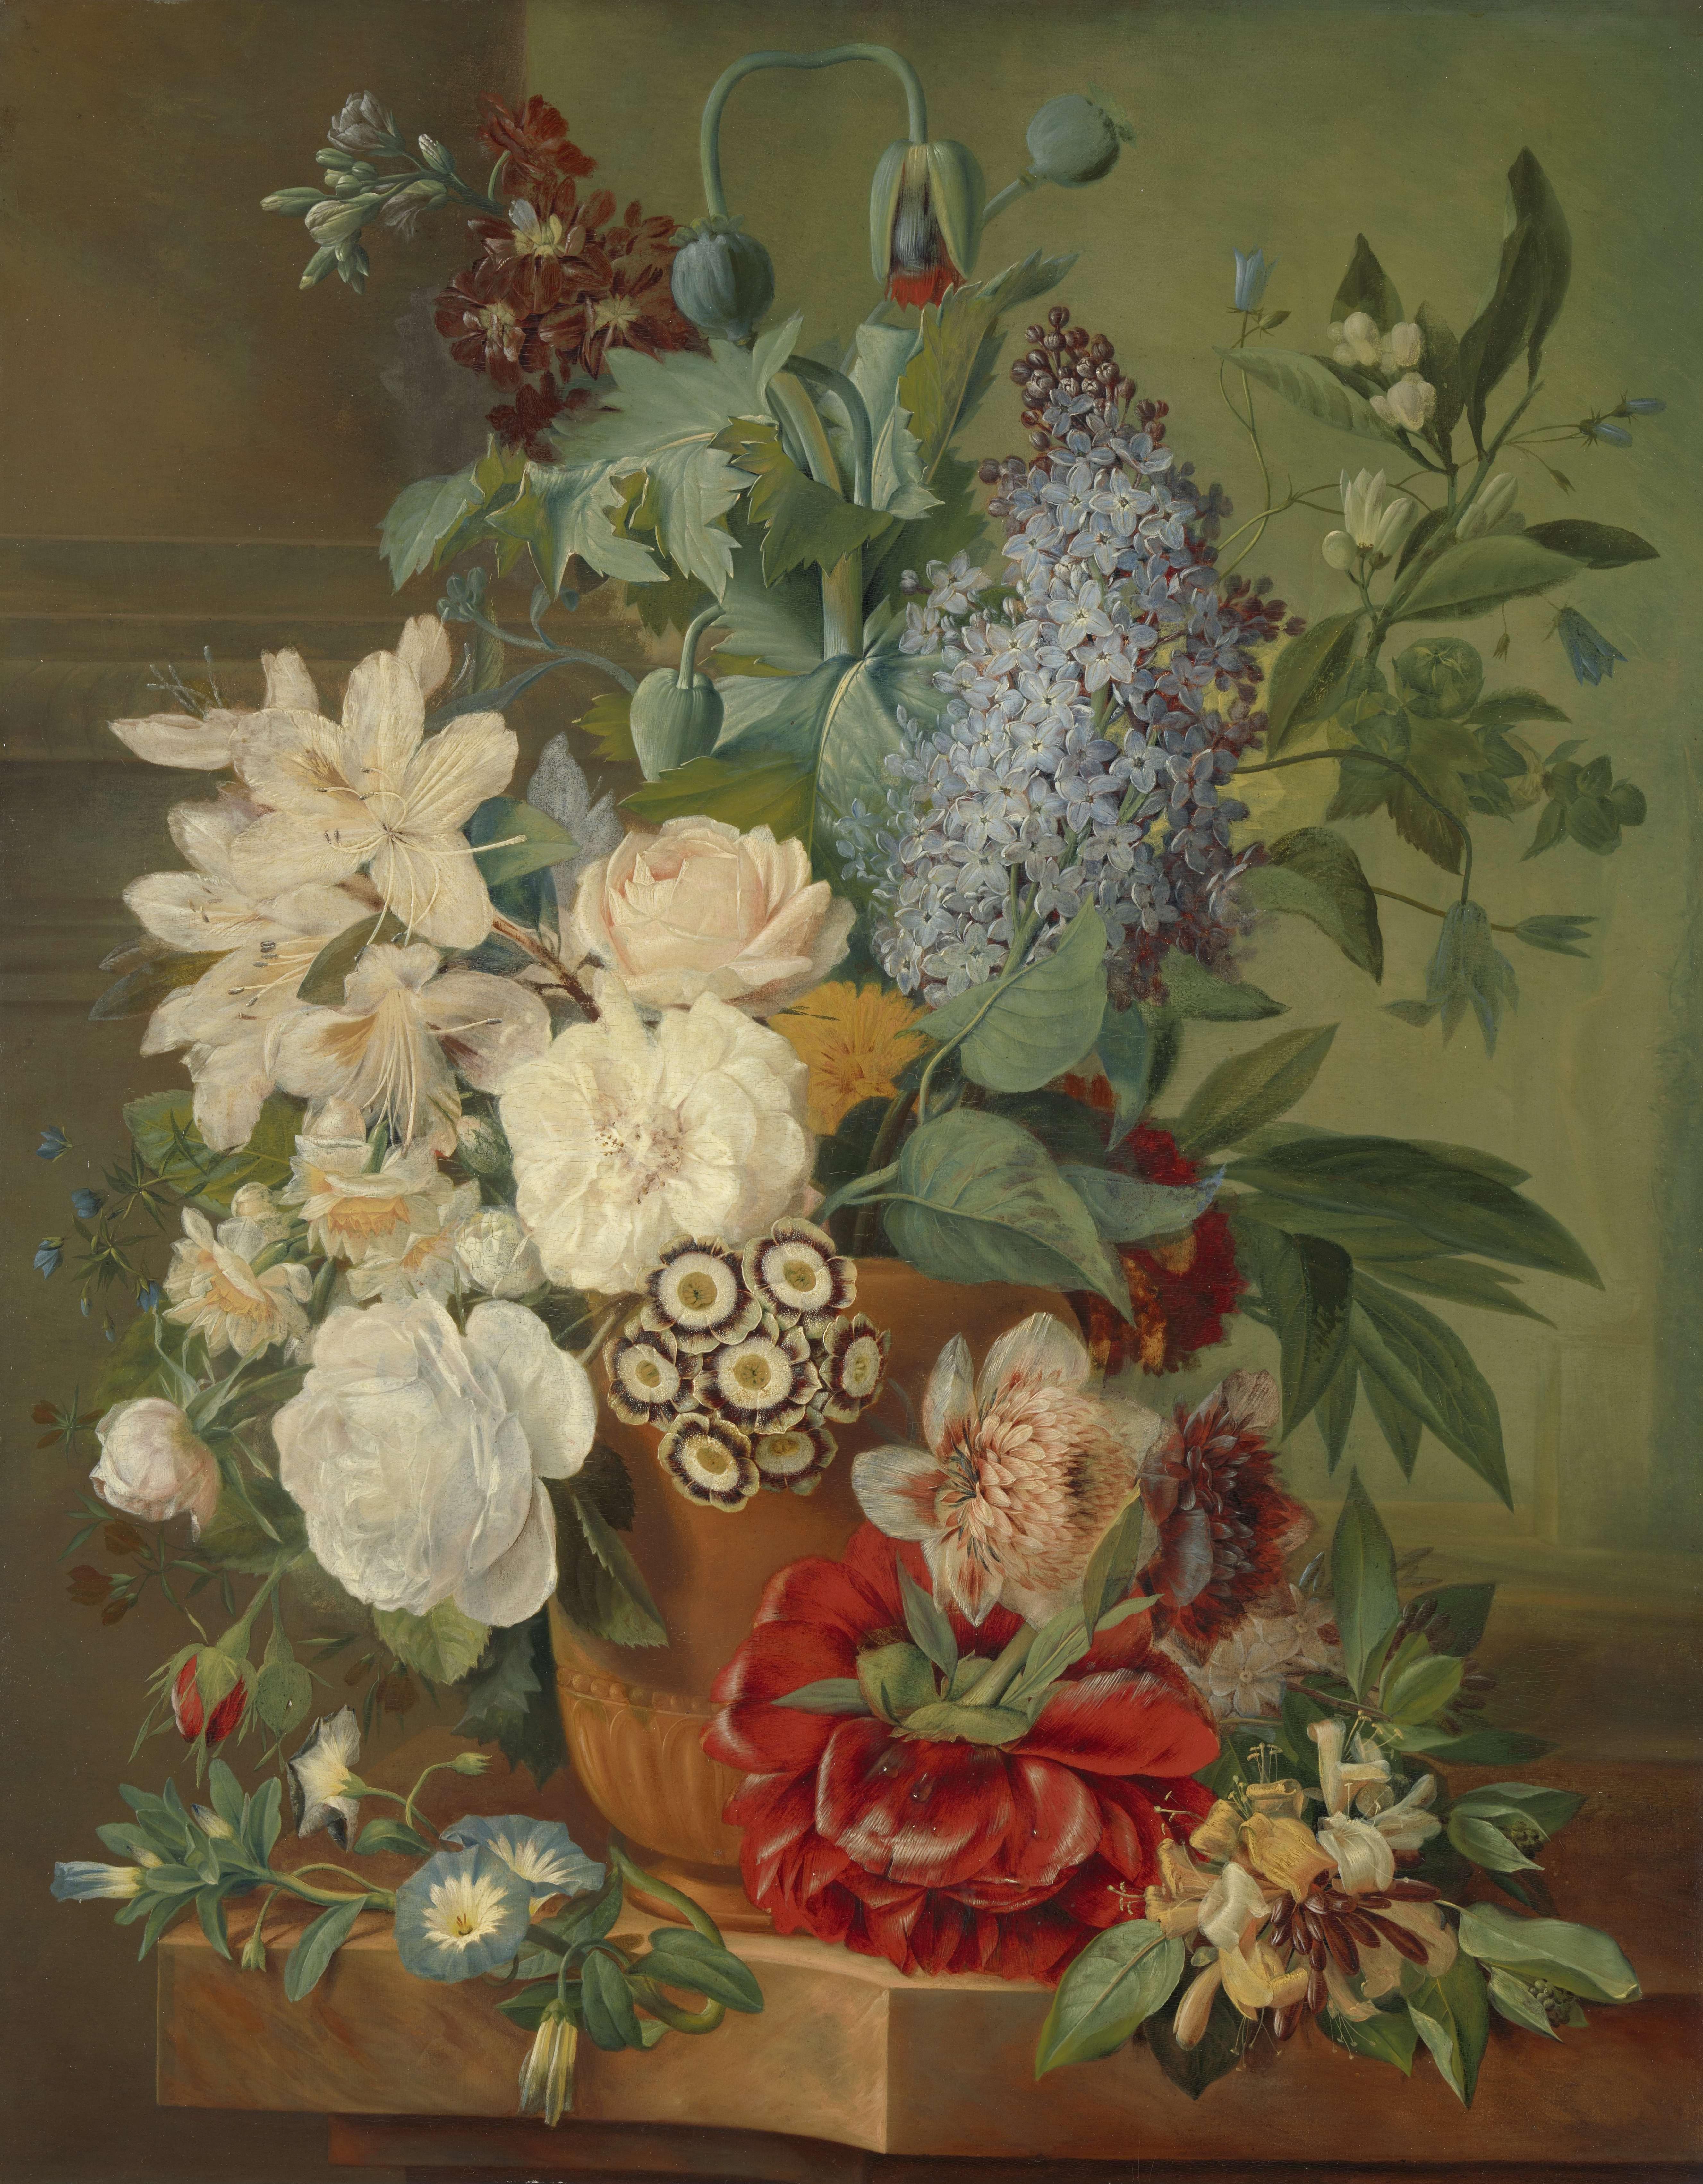 vincent van gogh vase with red poppies of wikipediawikipedia signpost single 2015 03 04 wikipedia within flowers in a terracotta vase albertus jonas brandt and eelke jelles eelkema